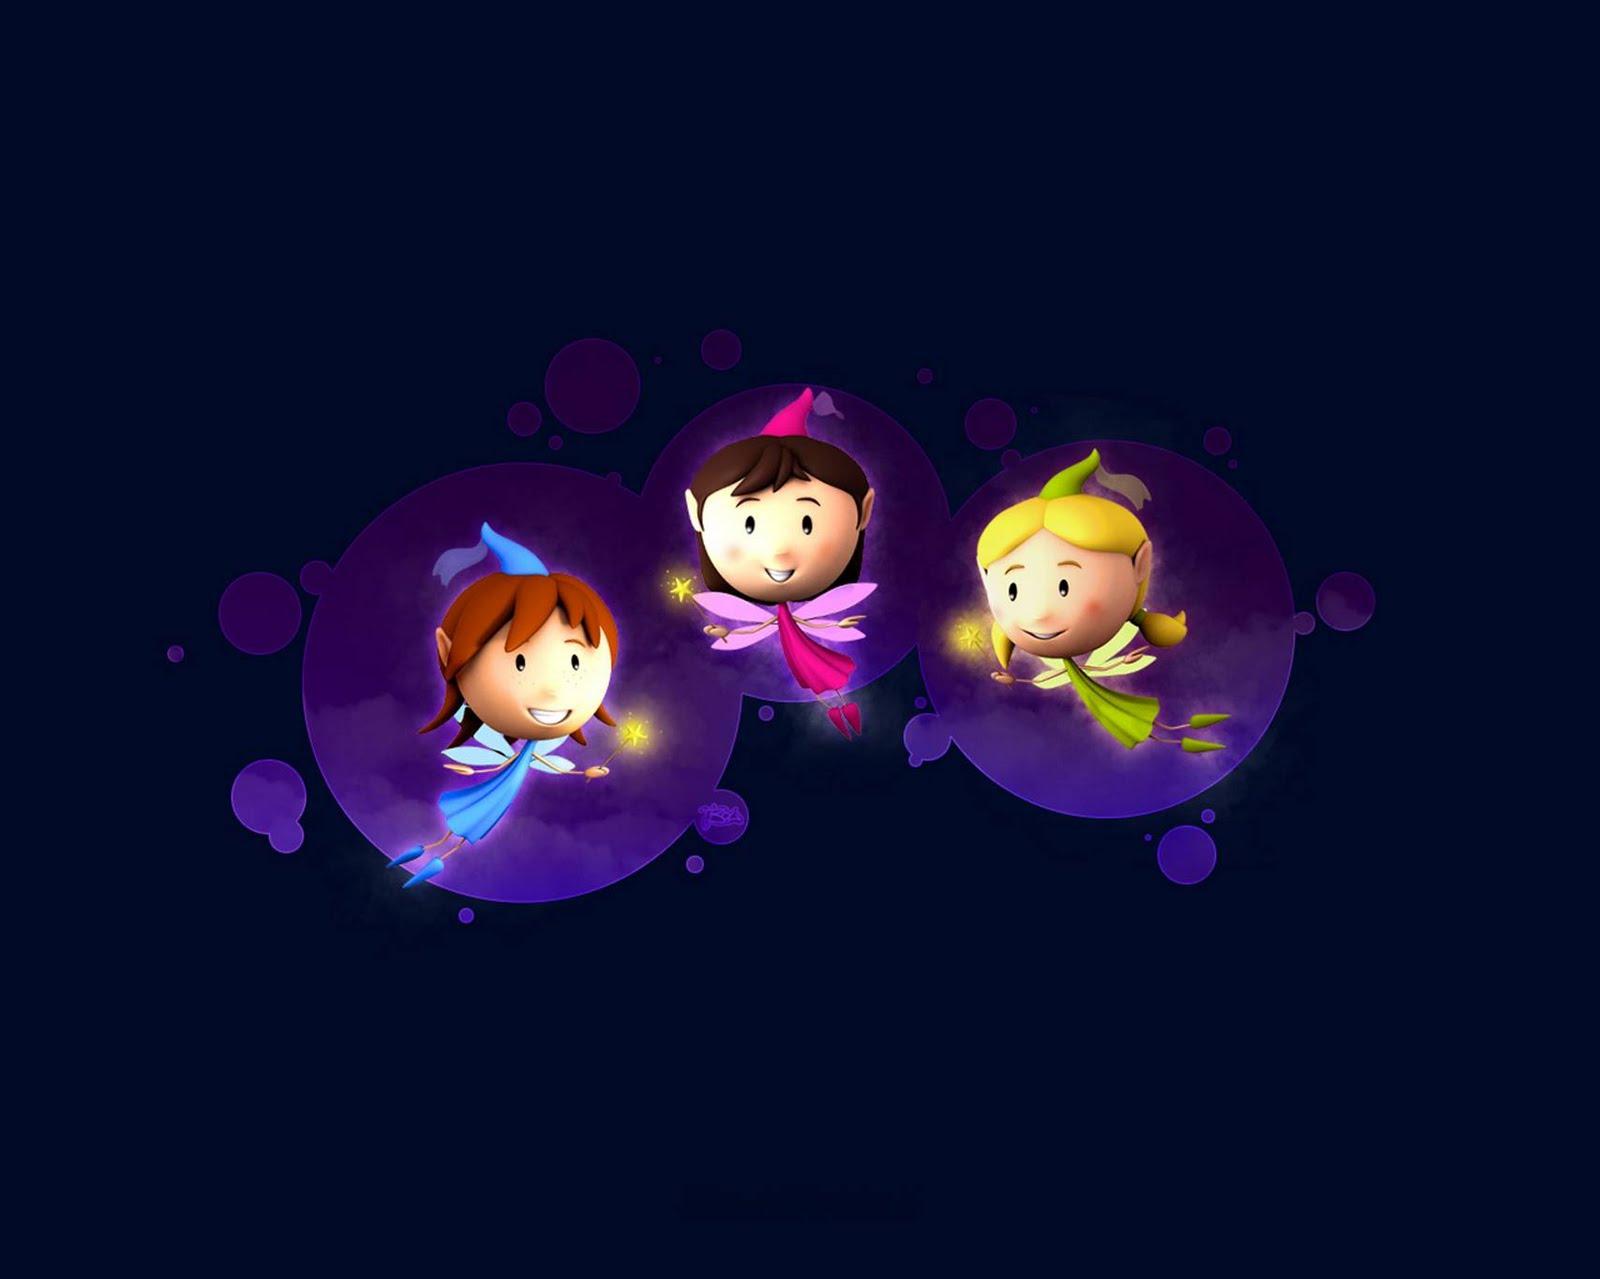 Free Desktop Wallpapers Backgrounds 3d Cartoon Wallpapers 3d